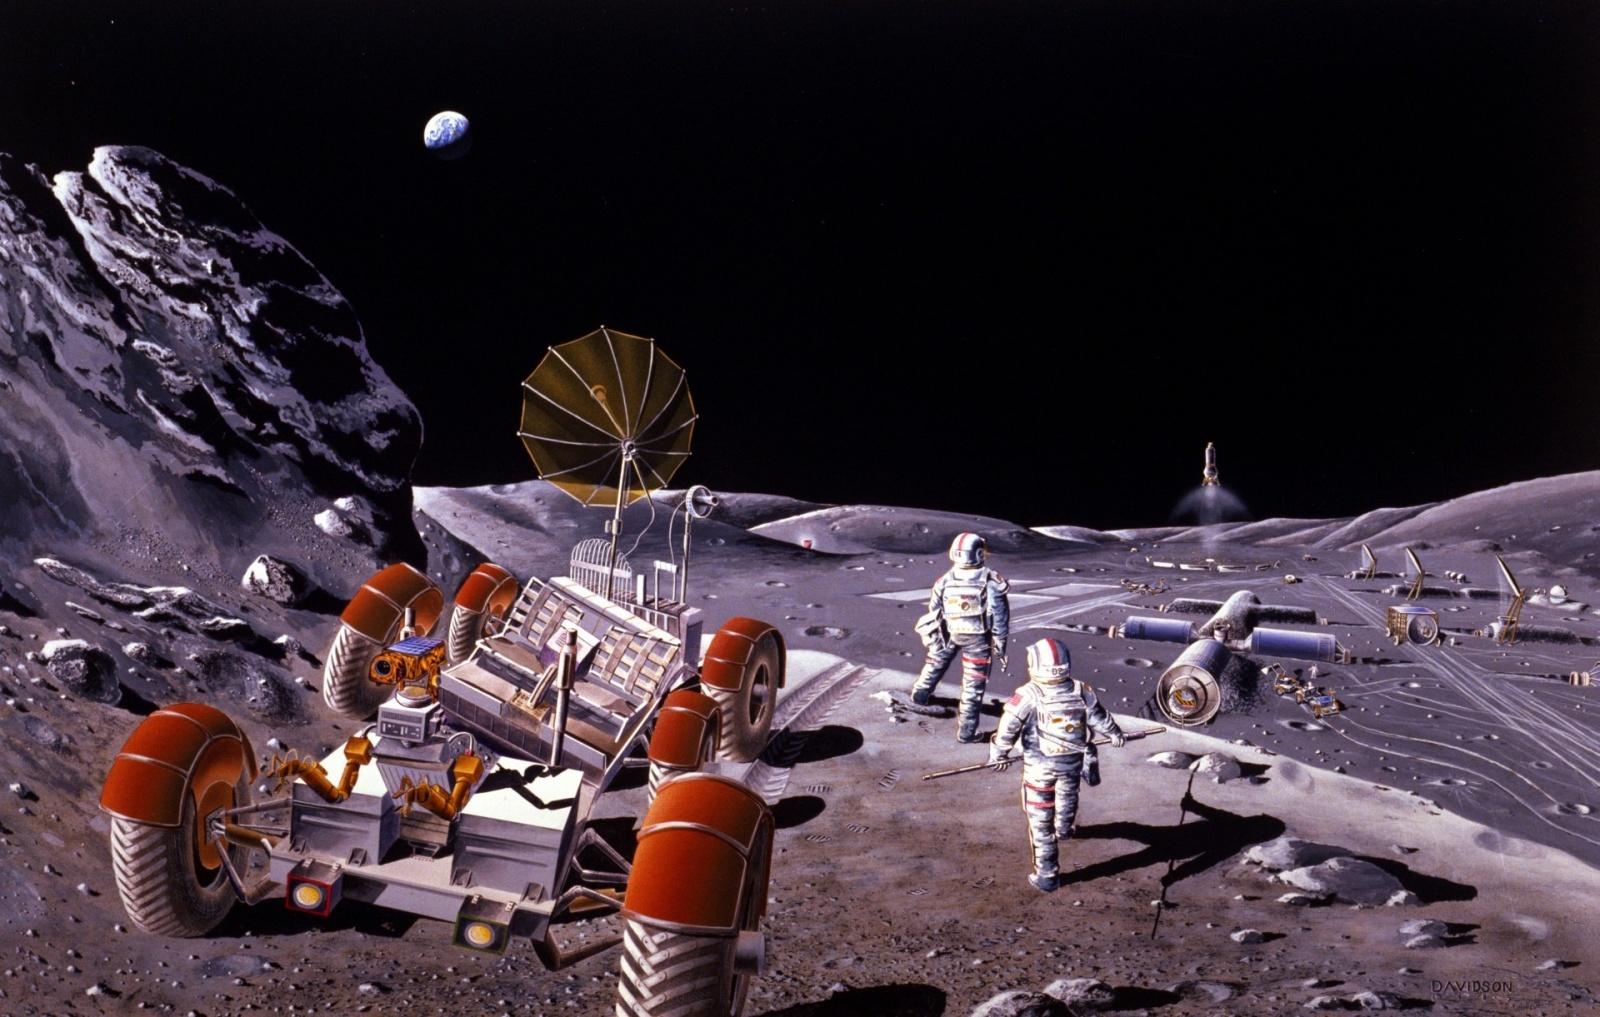 Scientists reveal design plans for future lunar base